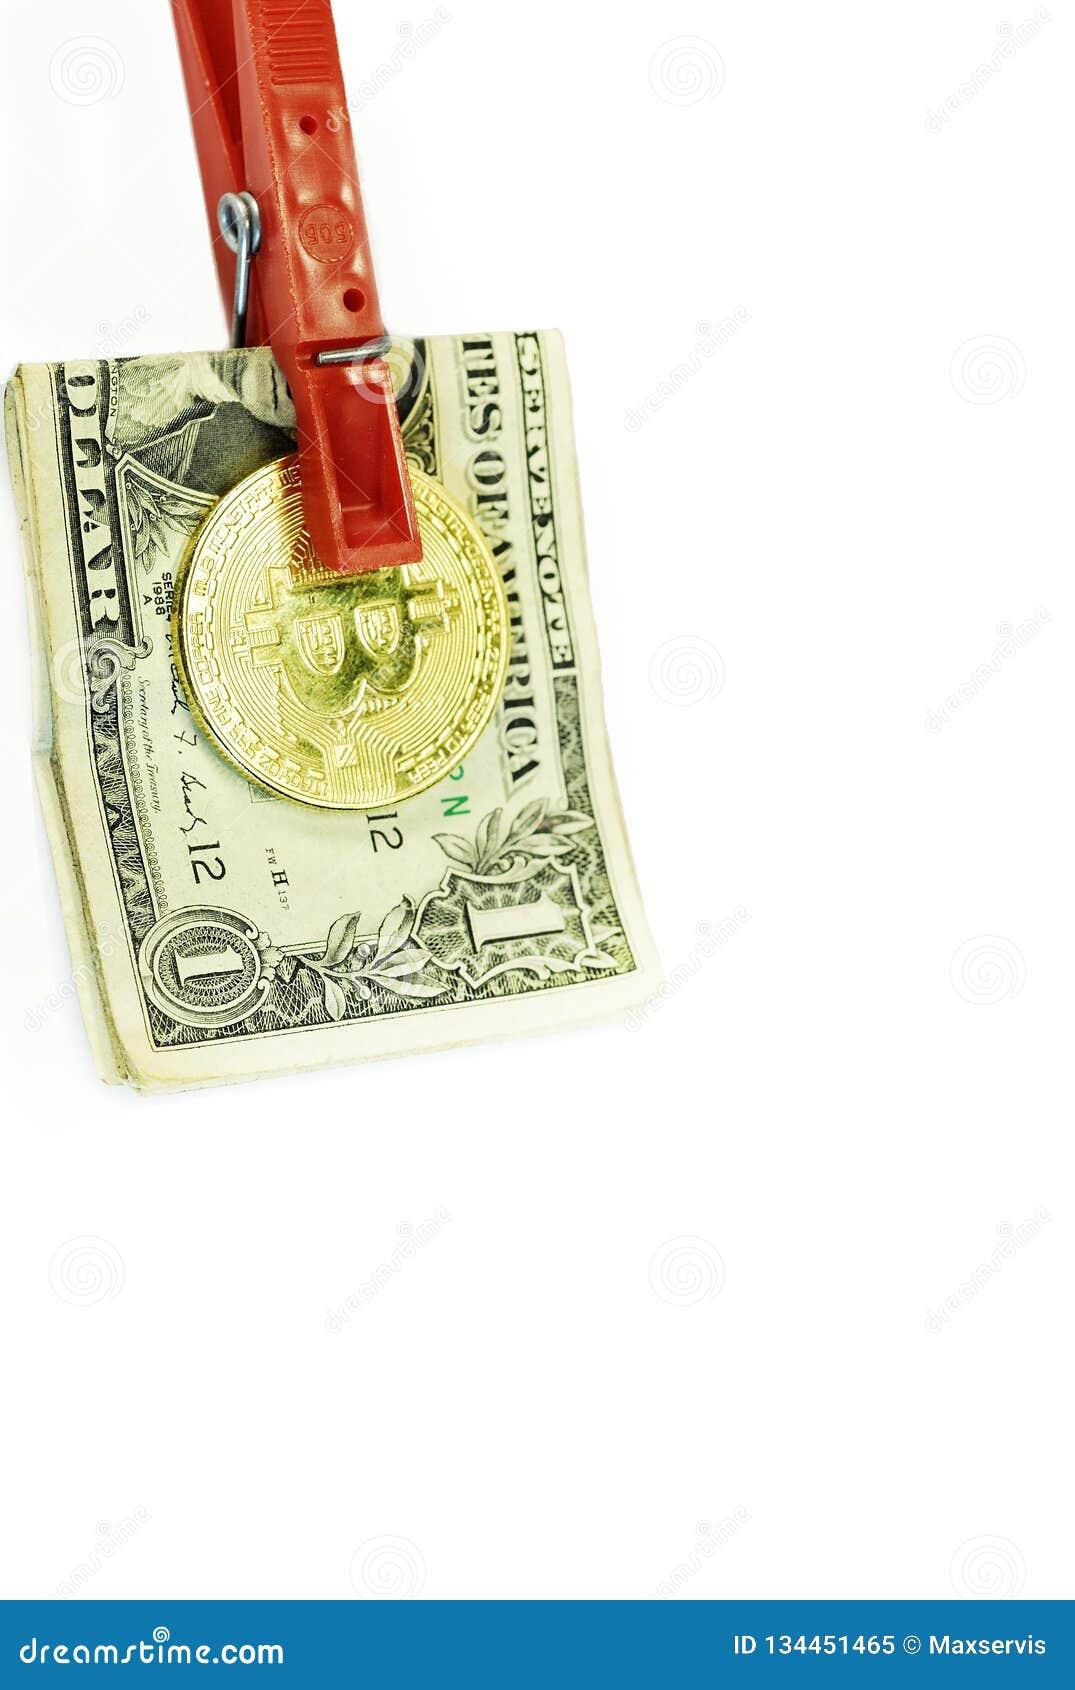 Selling bitcoins money laundering rzepa plus minus betting